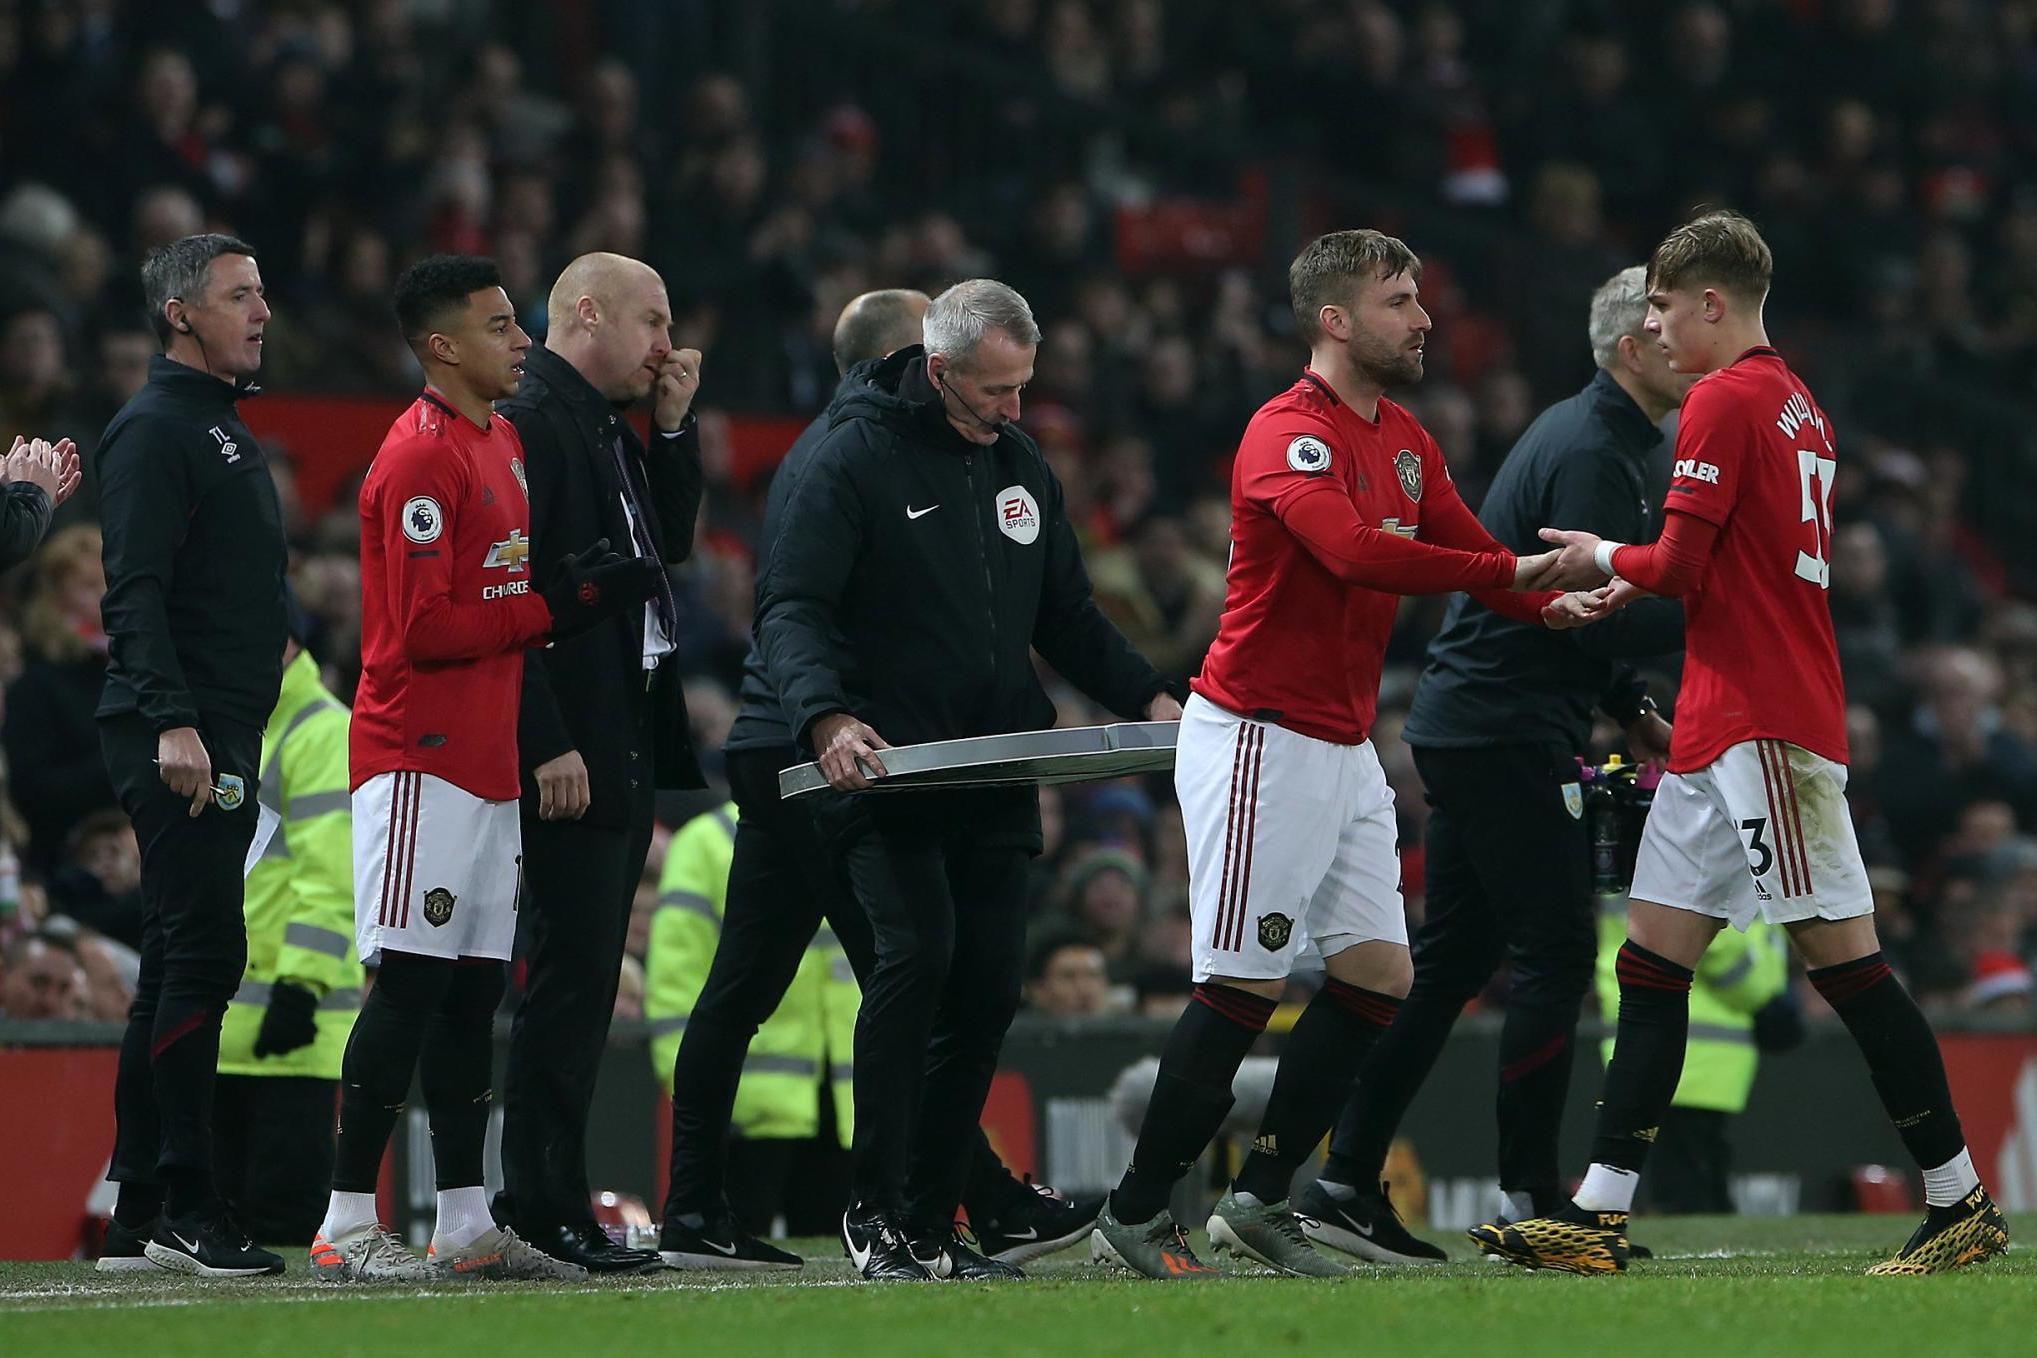 Man Utd hero Rio Ferdinand pinpoints six transfers that lay bare Ed Woodward failings - Bóng Đá